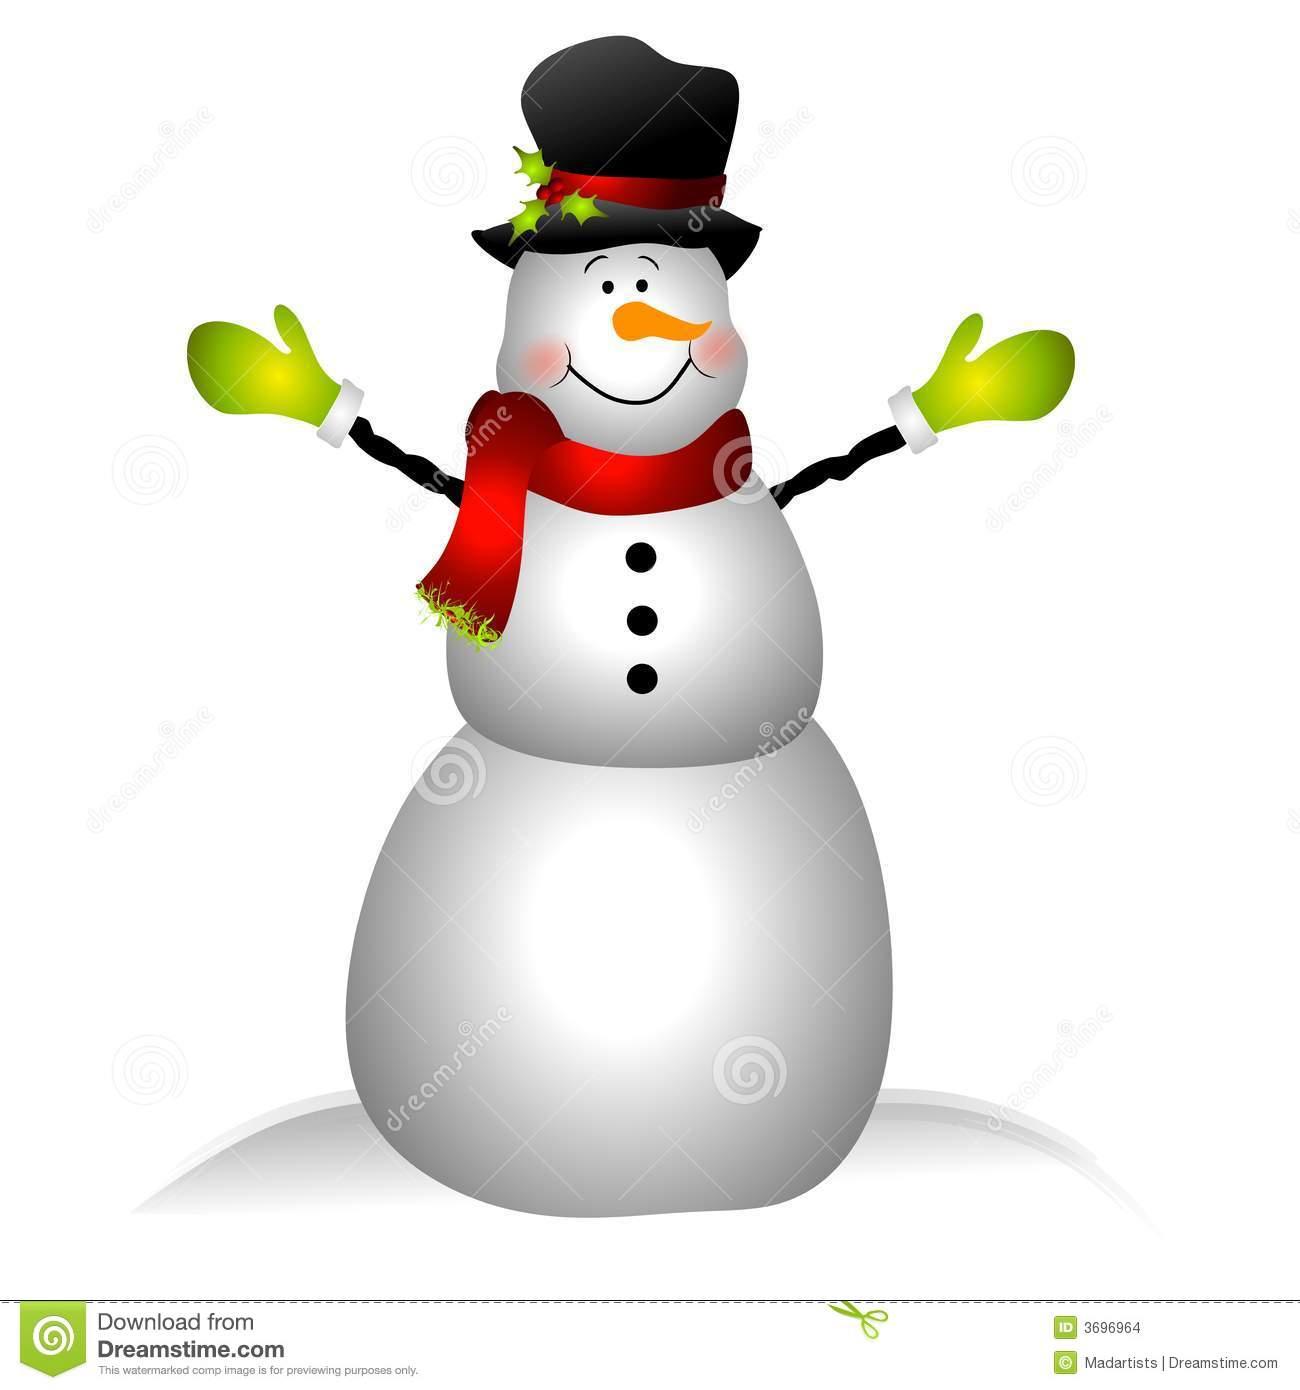 Clip Art Illustration Featuring A Snowma-Clip Art Illustration Featuring A Snowman Dressed In Hat Scarf-1